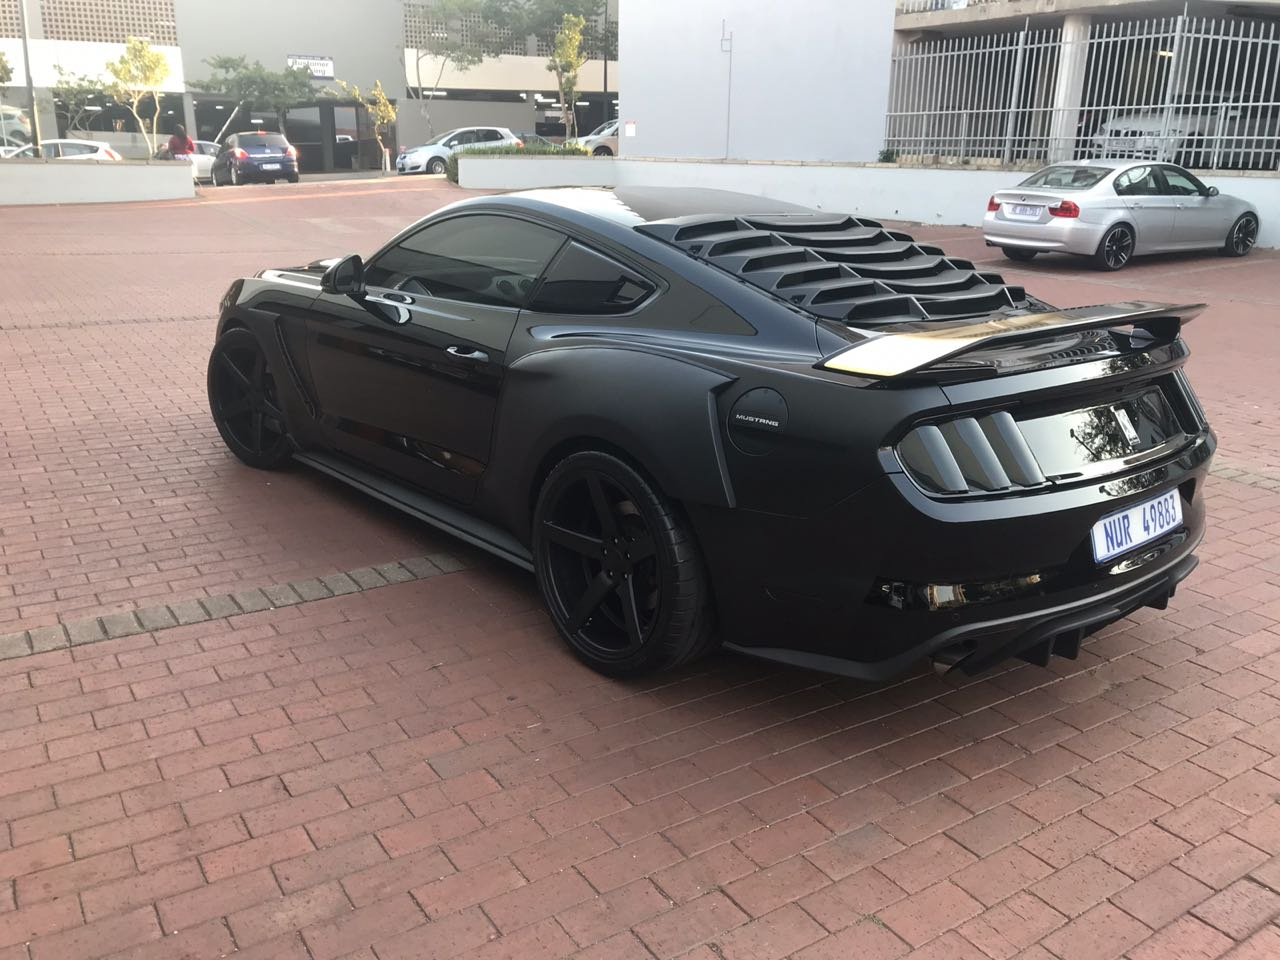 Ford Mustang Body Kits